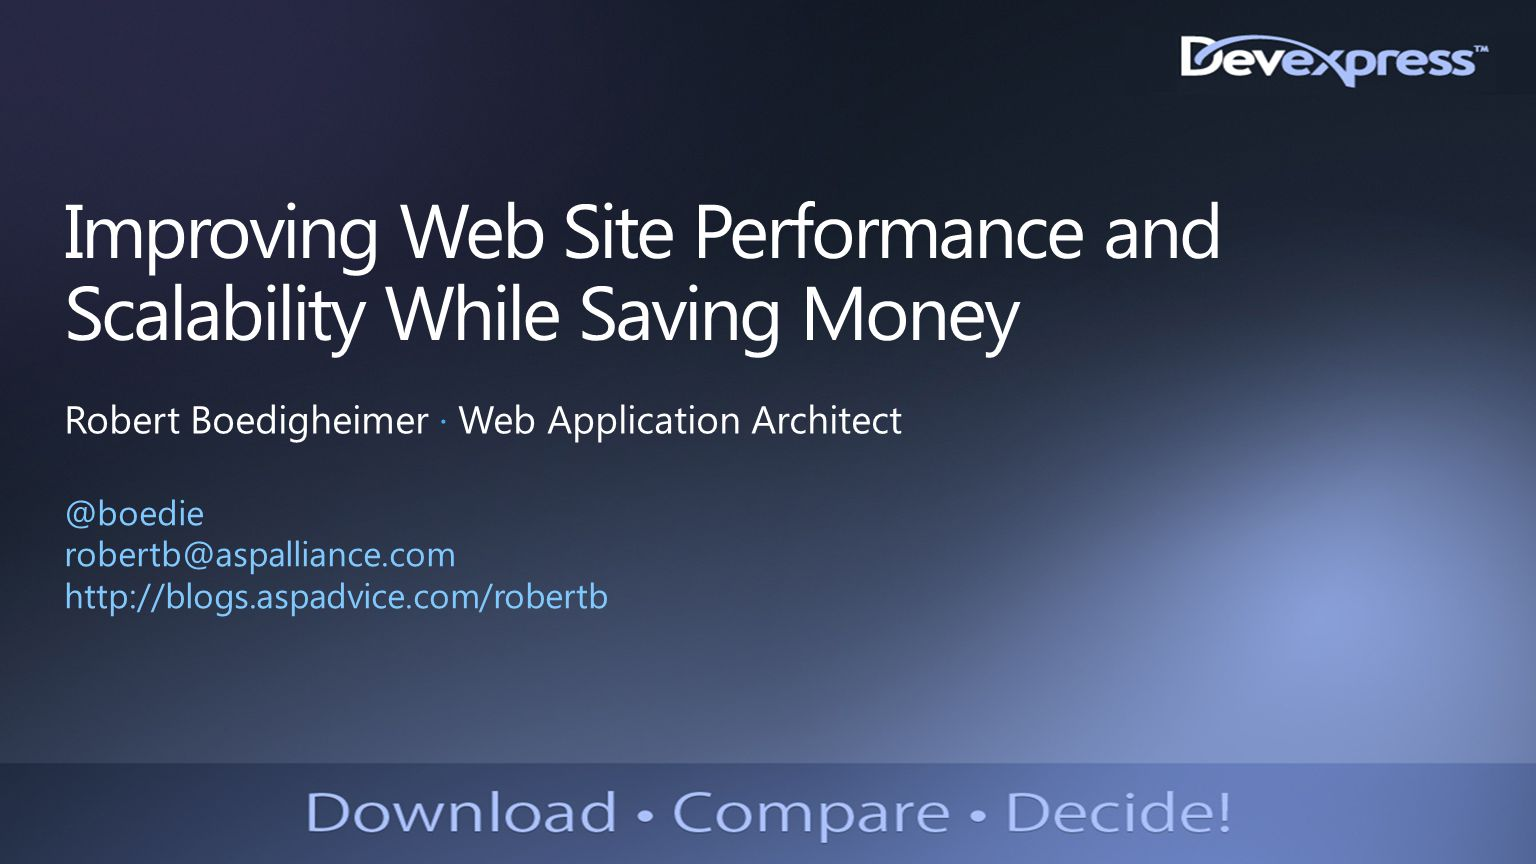 Improving Web Site Performance and Scalability While Saving Money Robert Boedigheimer ∙ Web Application Architect @boedie robertb@aspalliance.com http